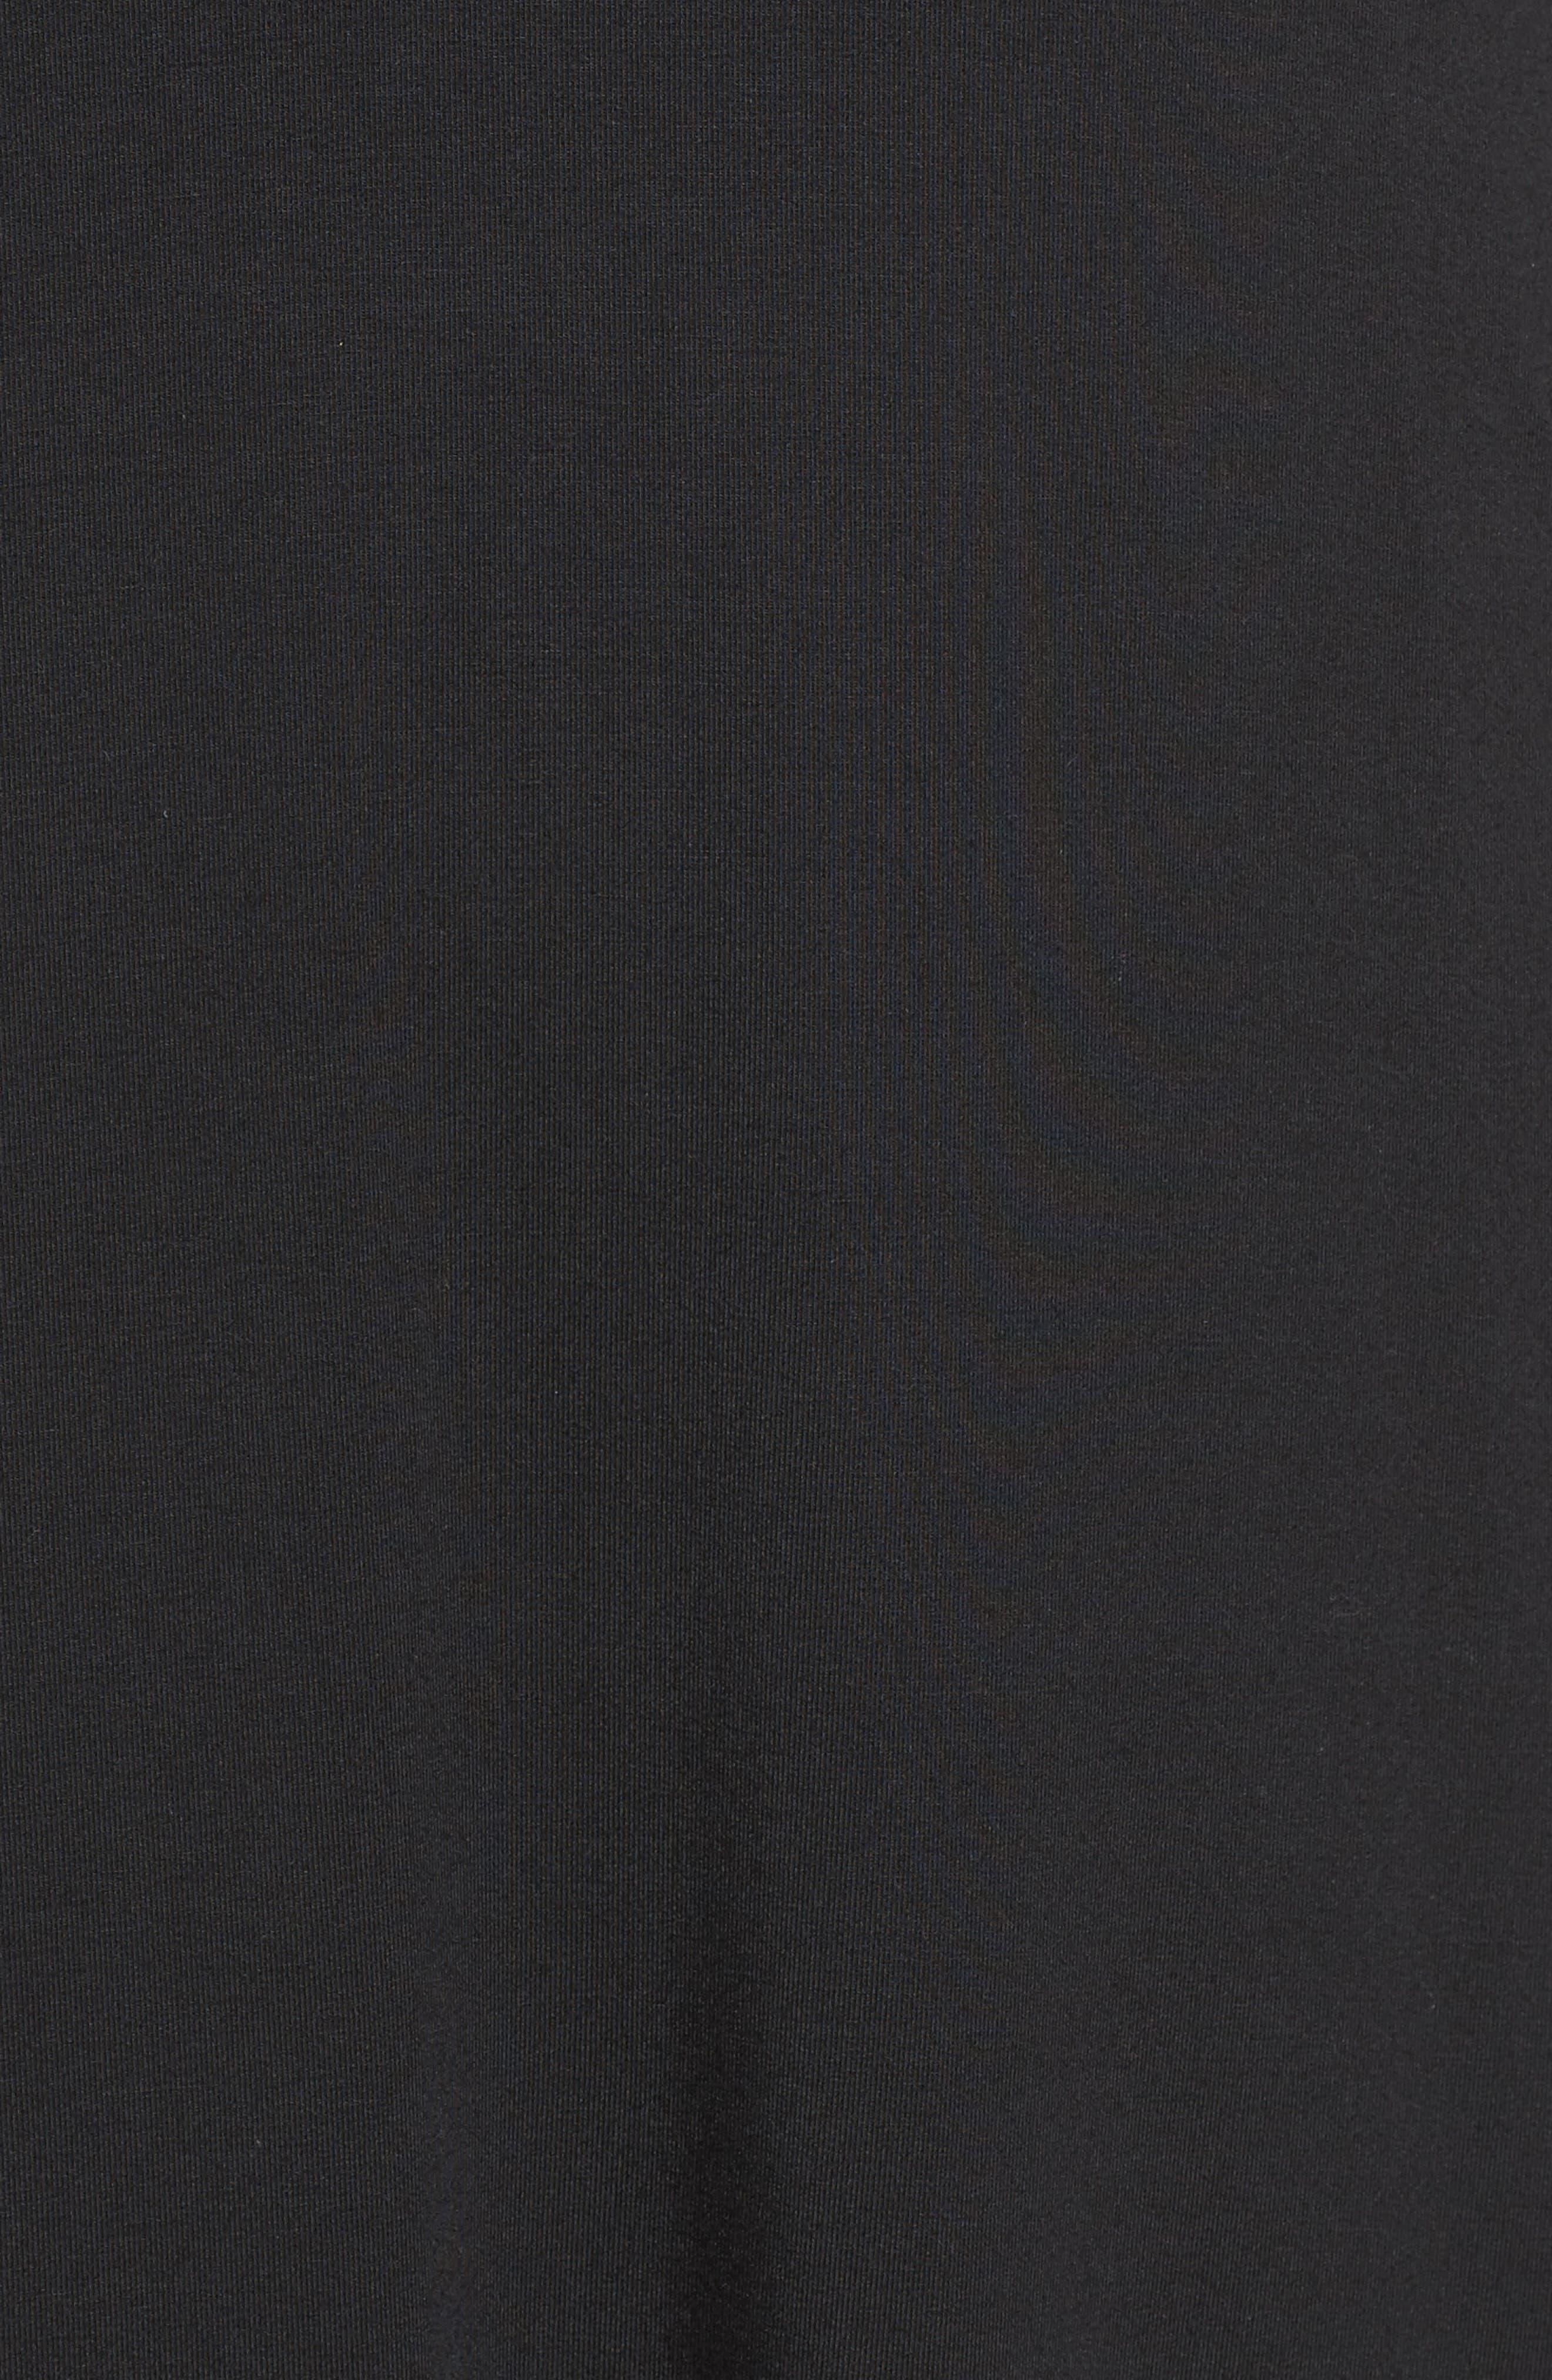 Sally Turtleneck A-Line Dress,                             Alternate thumbnail 6, color,                             001